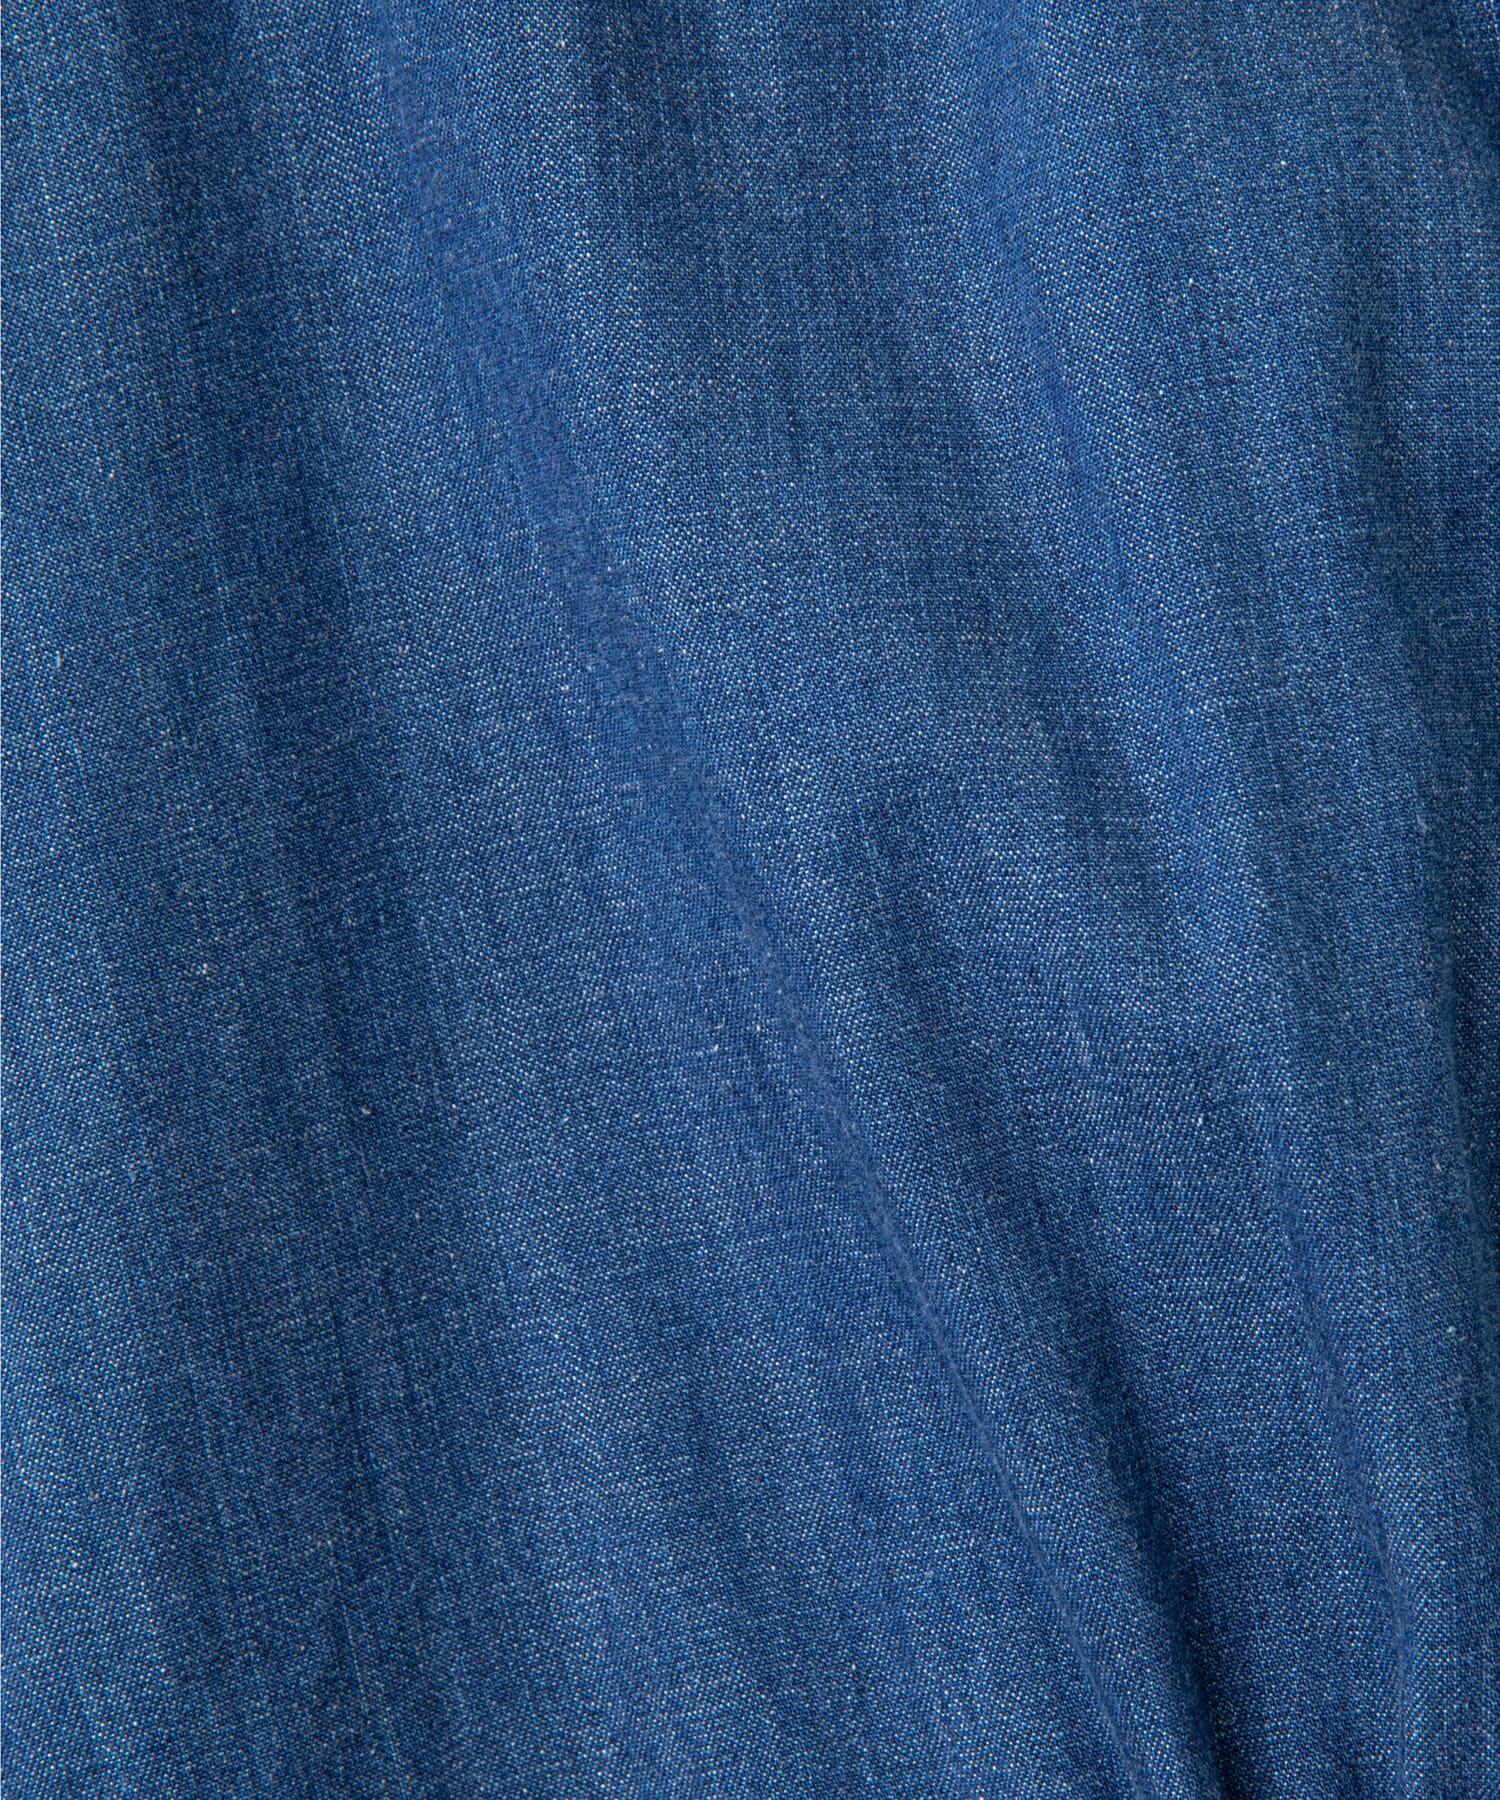 GALLARDAGALANTE(ガリャルダガランテ) 【HERITANOVUM】デニムショールシャツ